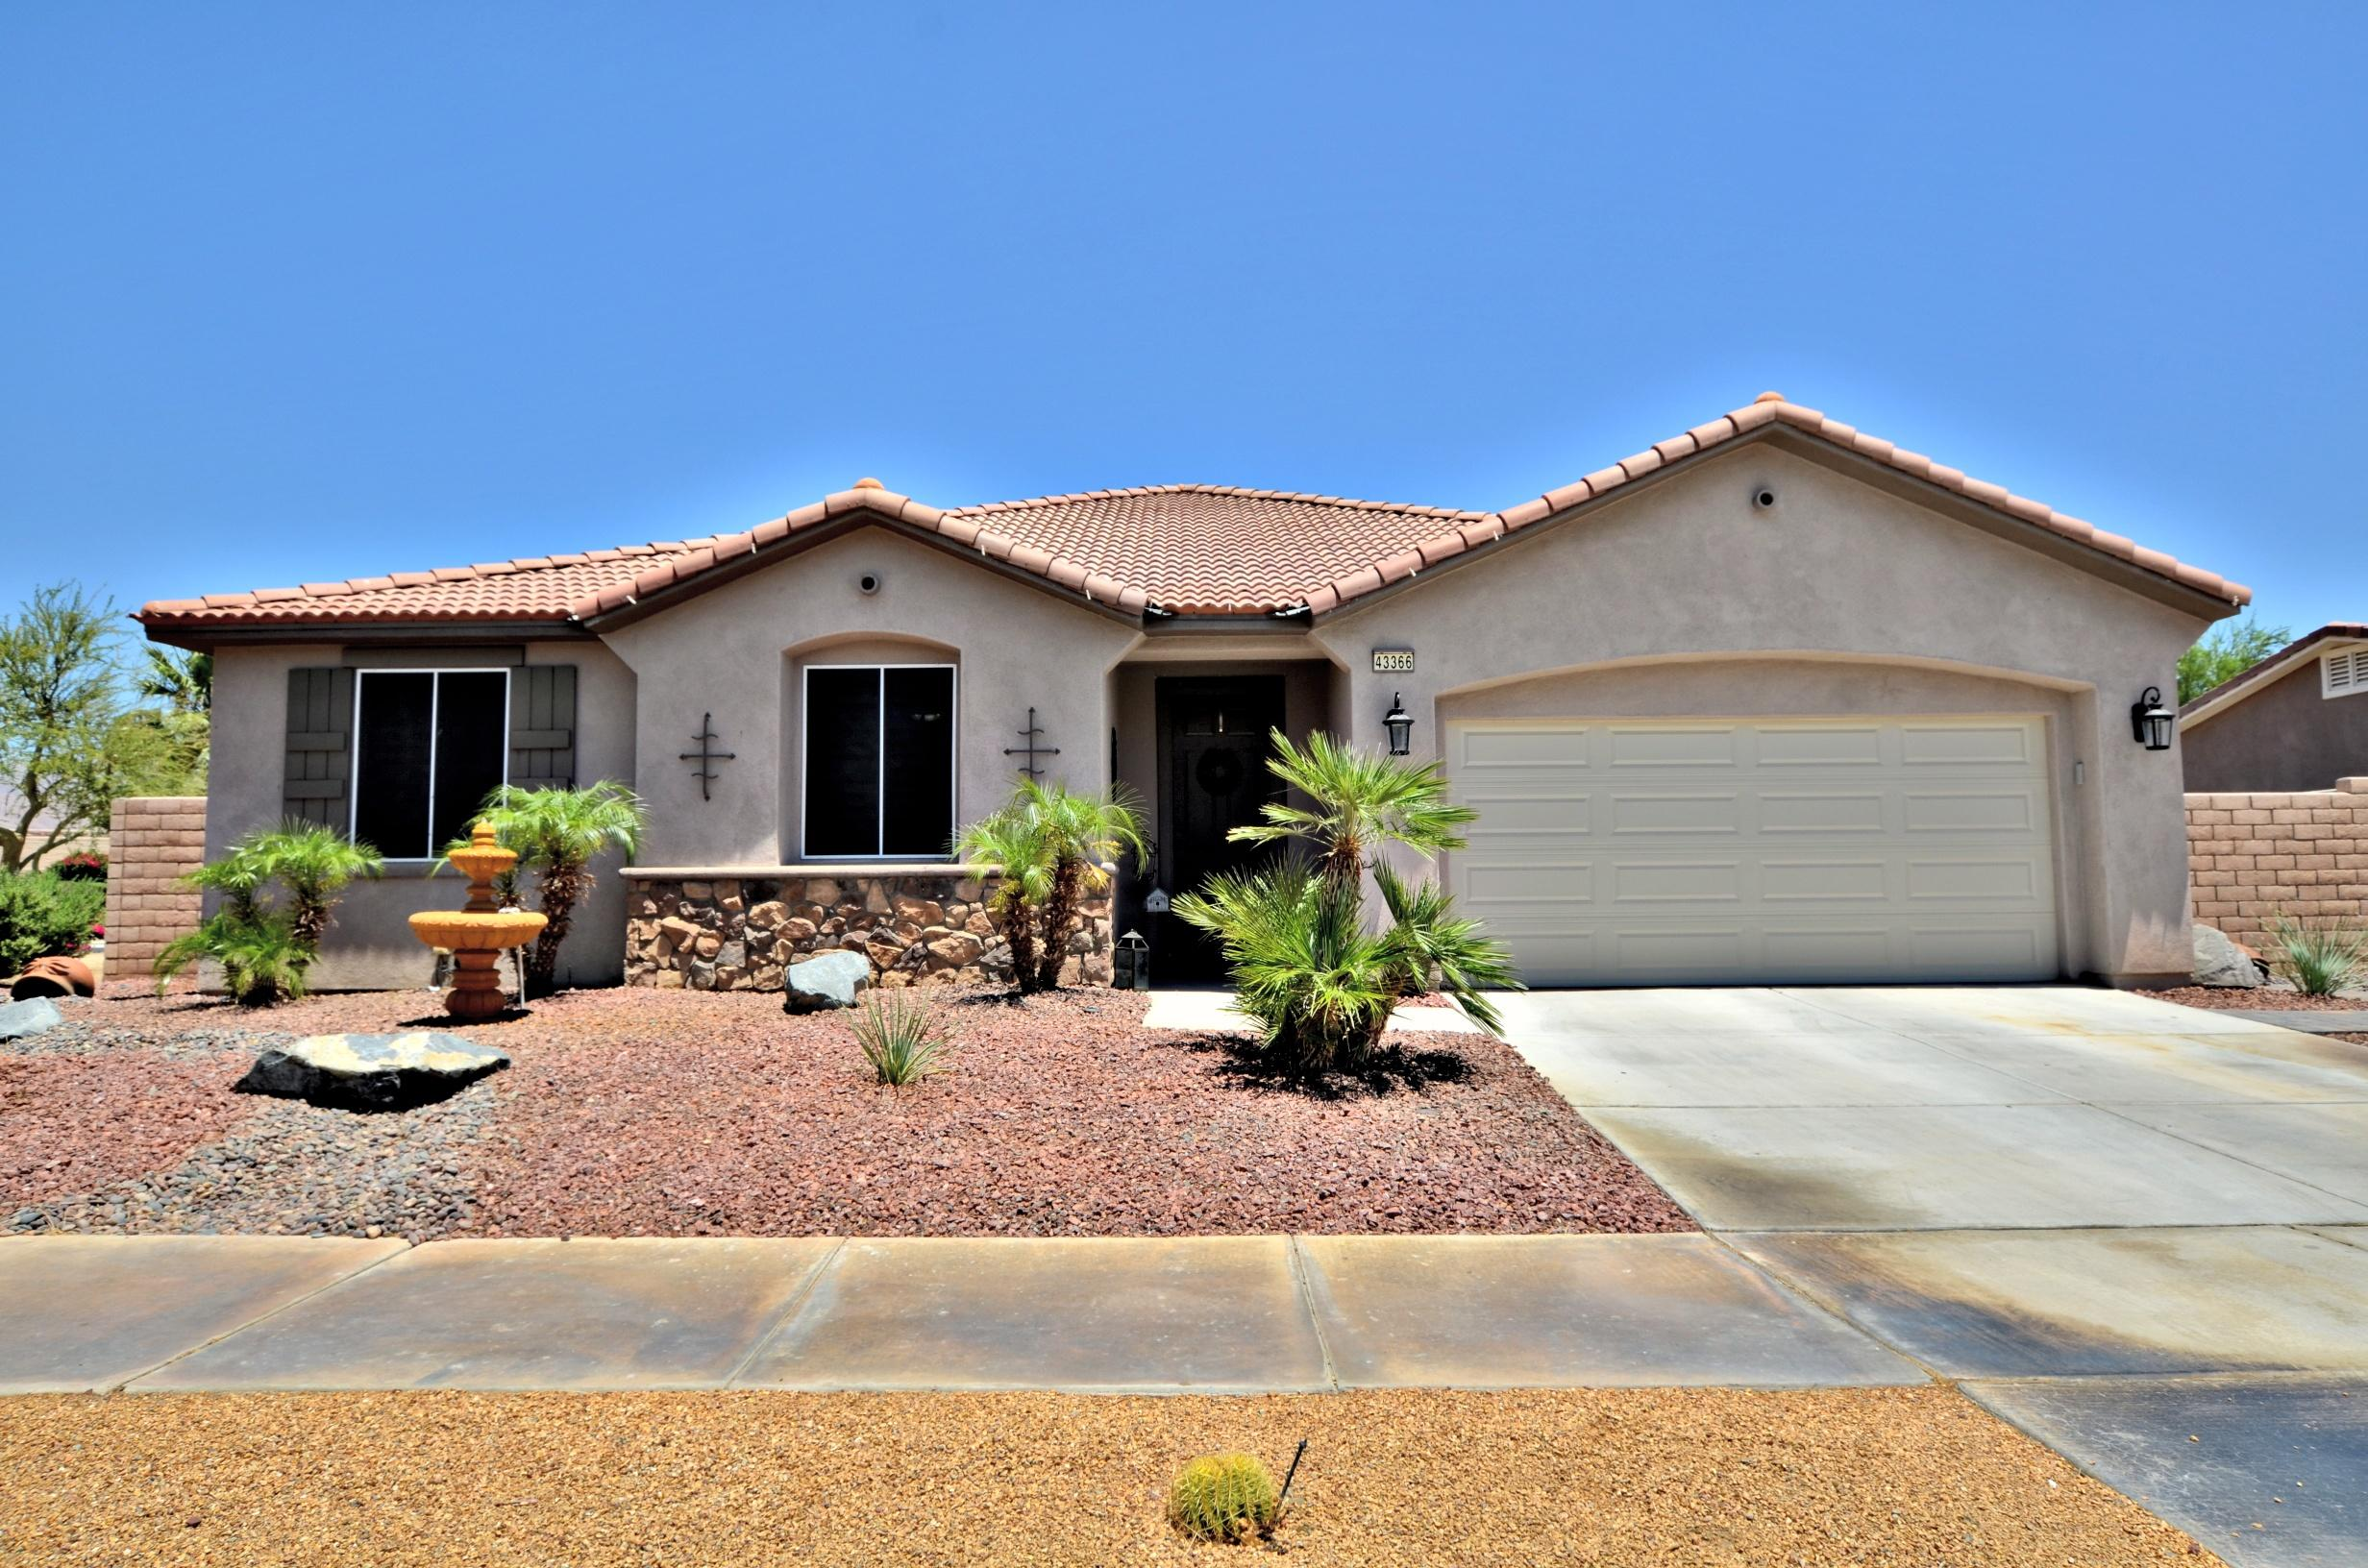 Photo of 43366 Fiore Street, Indio, CA 92203